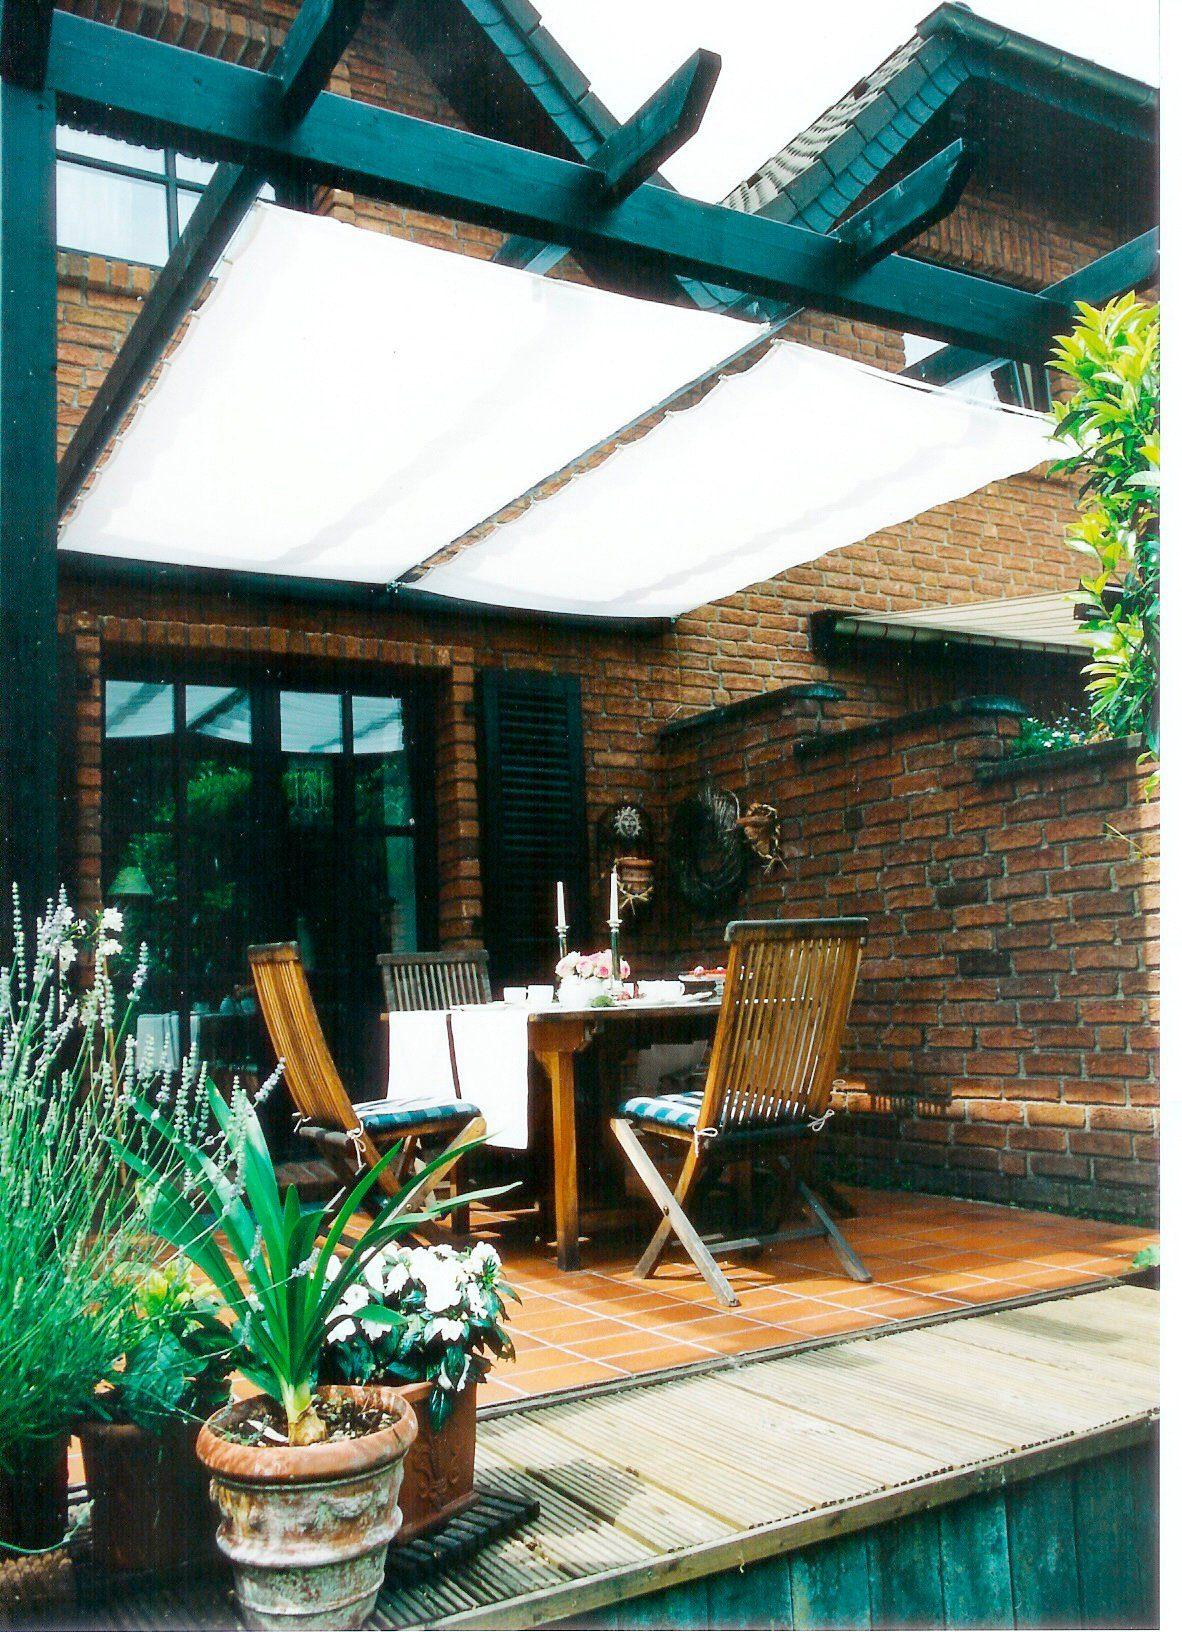 FLORACORD Sonnensegel mit Seilspann-Set, BxL: 420x140 cm, 1 Feld